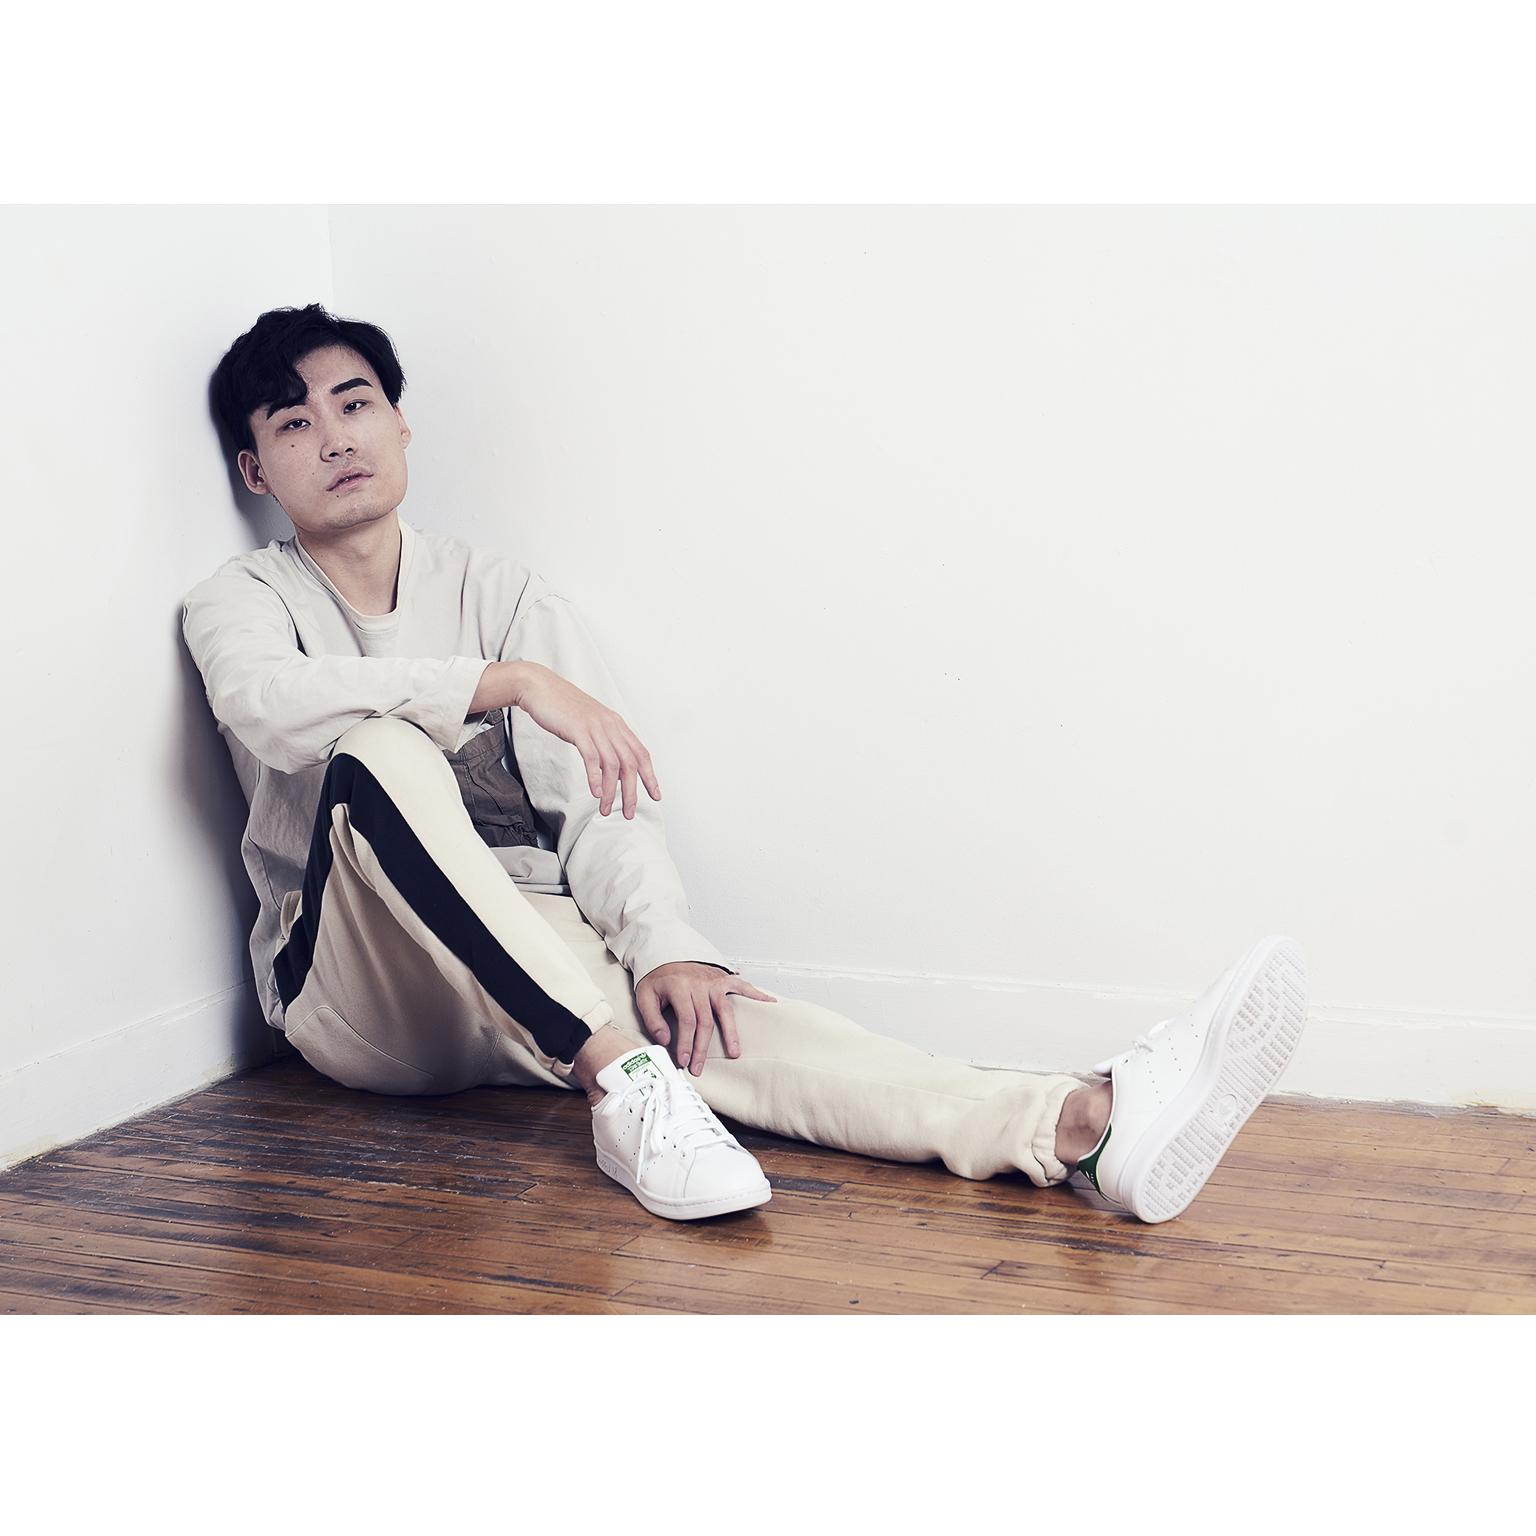 Toronto-Fitness-Model-Agency-Fitness-Casual-Commercial-Junhyuk-Ko-Casualwear